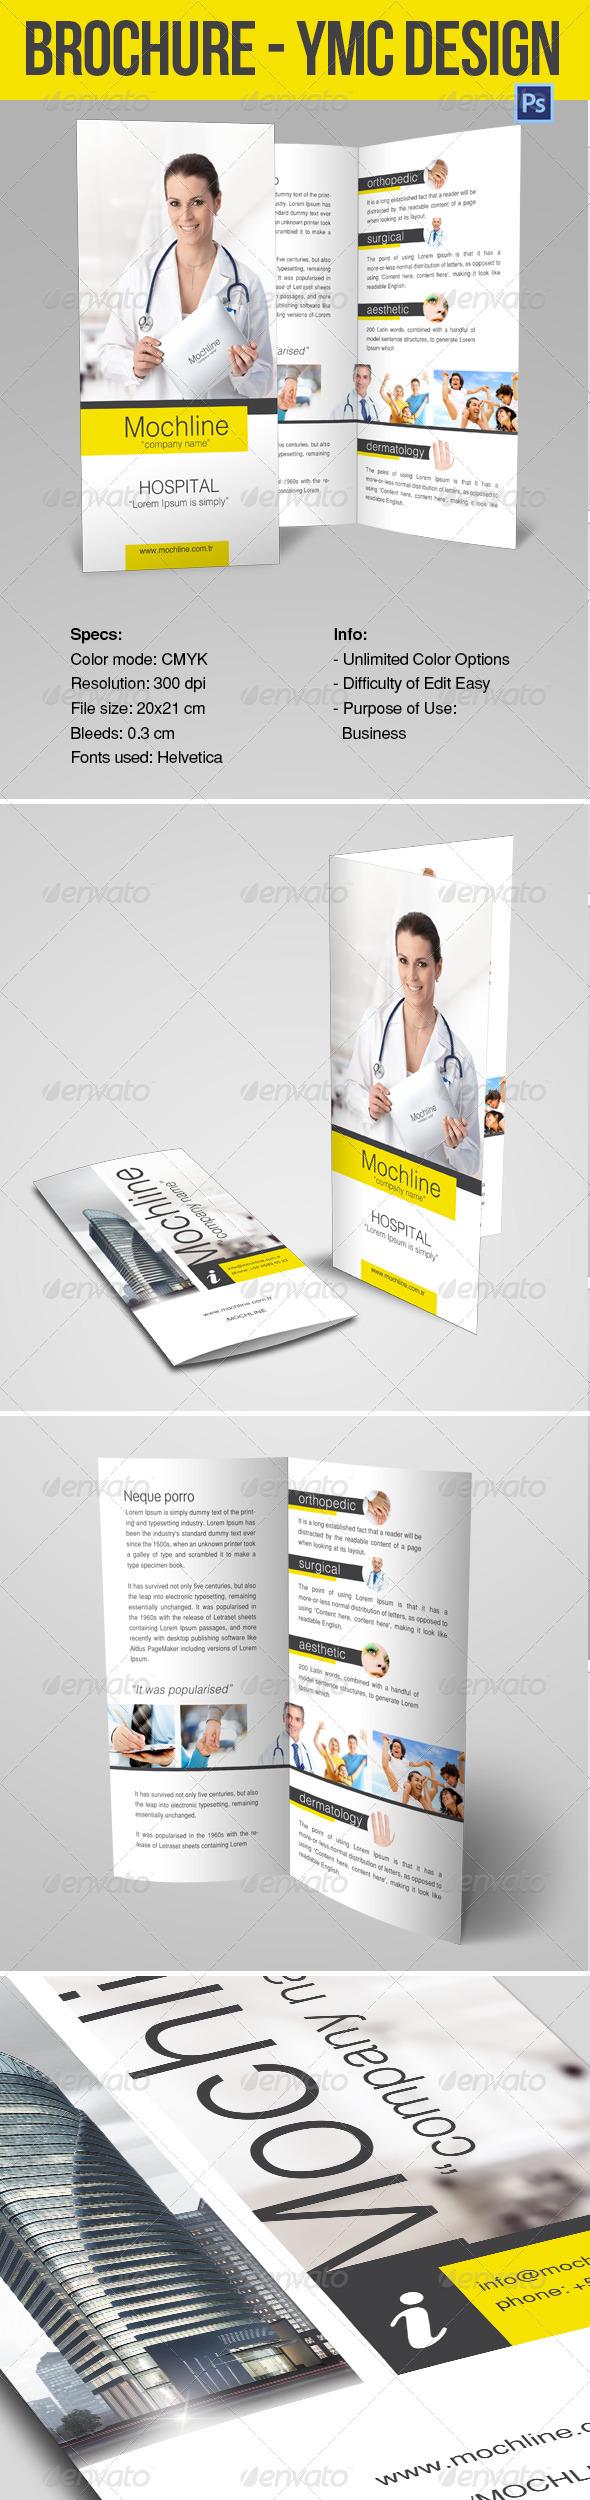 Brochure Health ymc Design - Print Templates